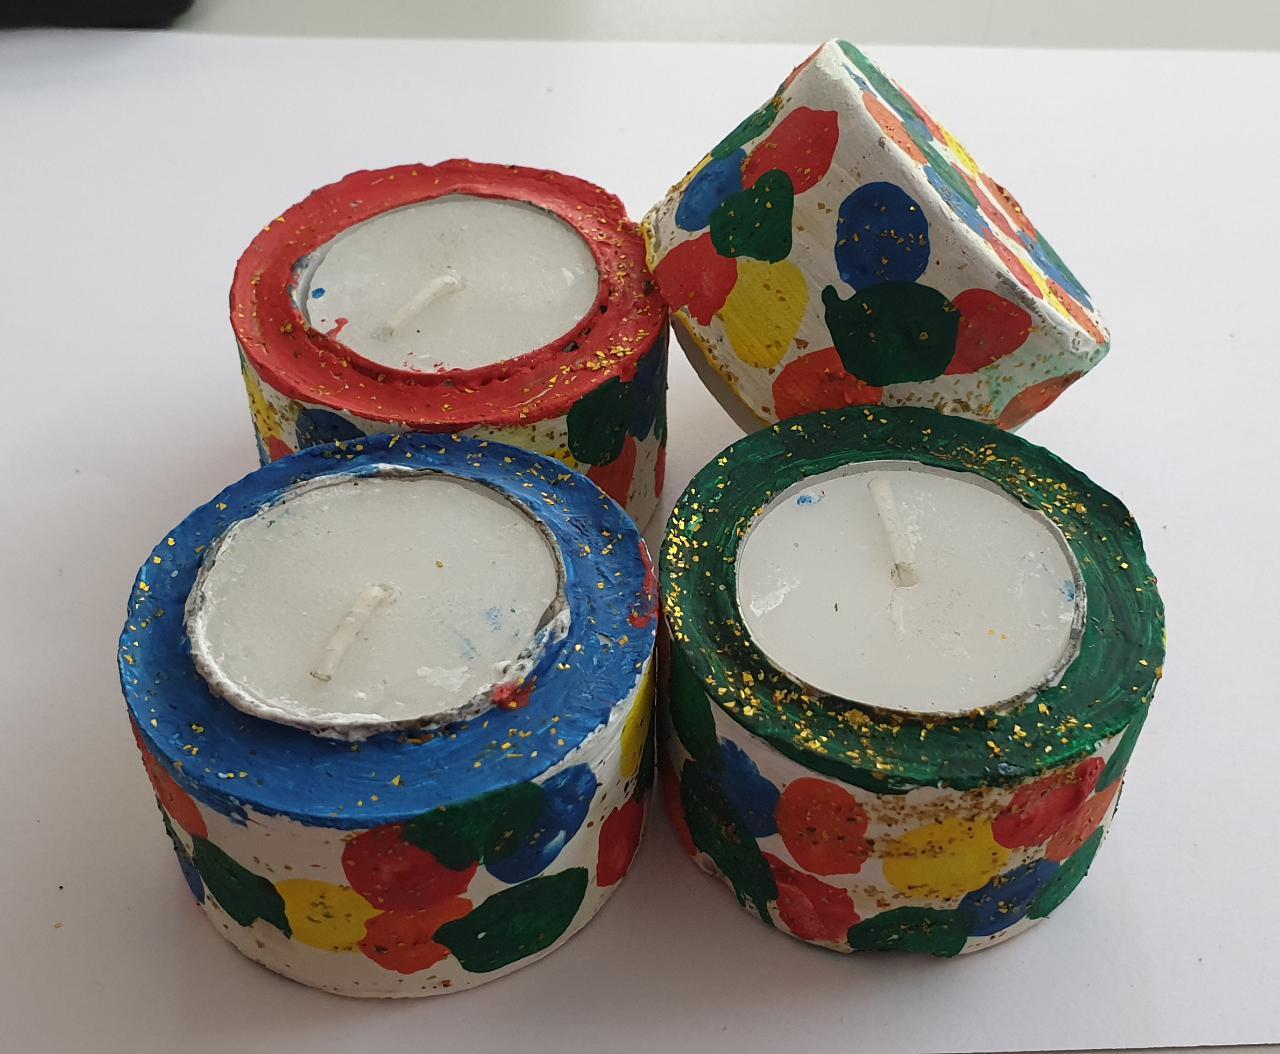 Diwali Hamper (Kumkum Chokha Plate, 4 Diyas, Roasted Almond, Roasted Cashew, Raisins, Honey) Slider Thumbnail 3/5